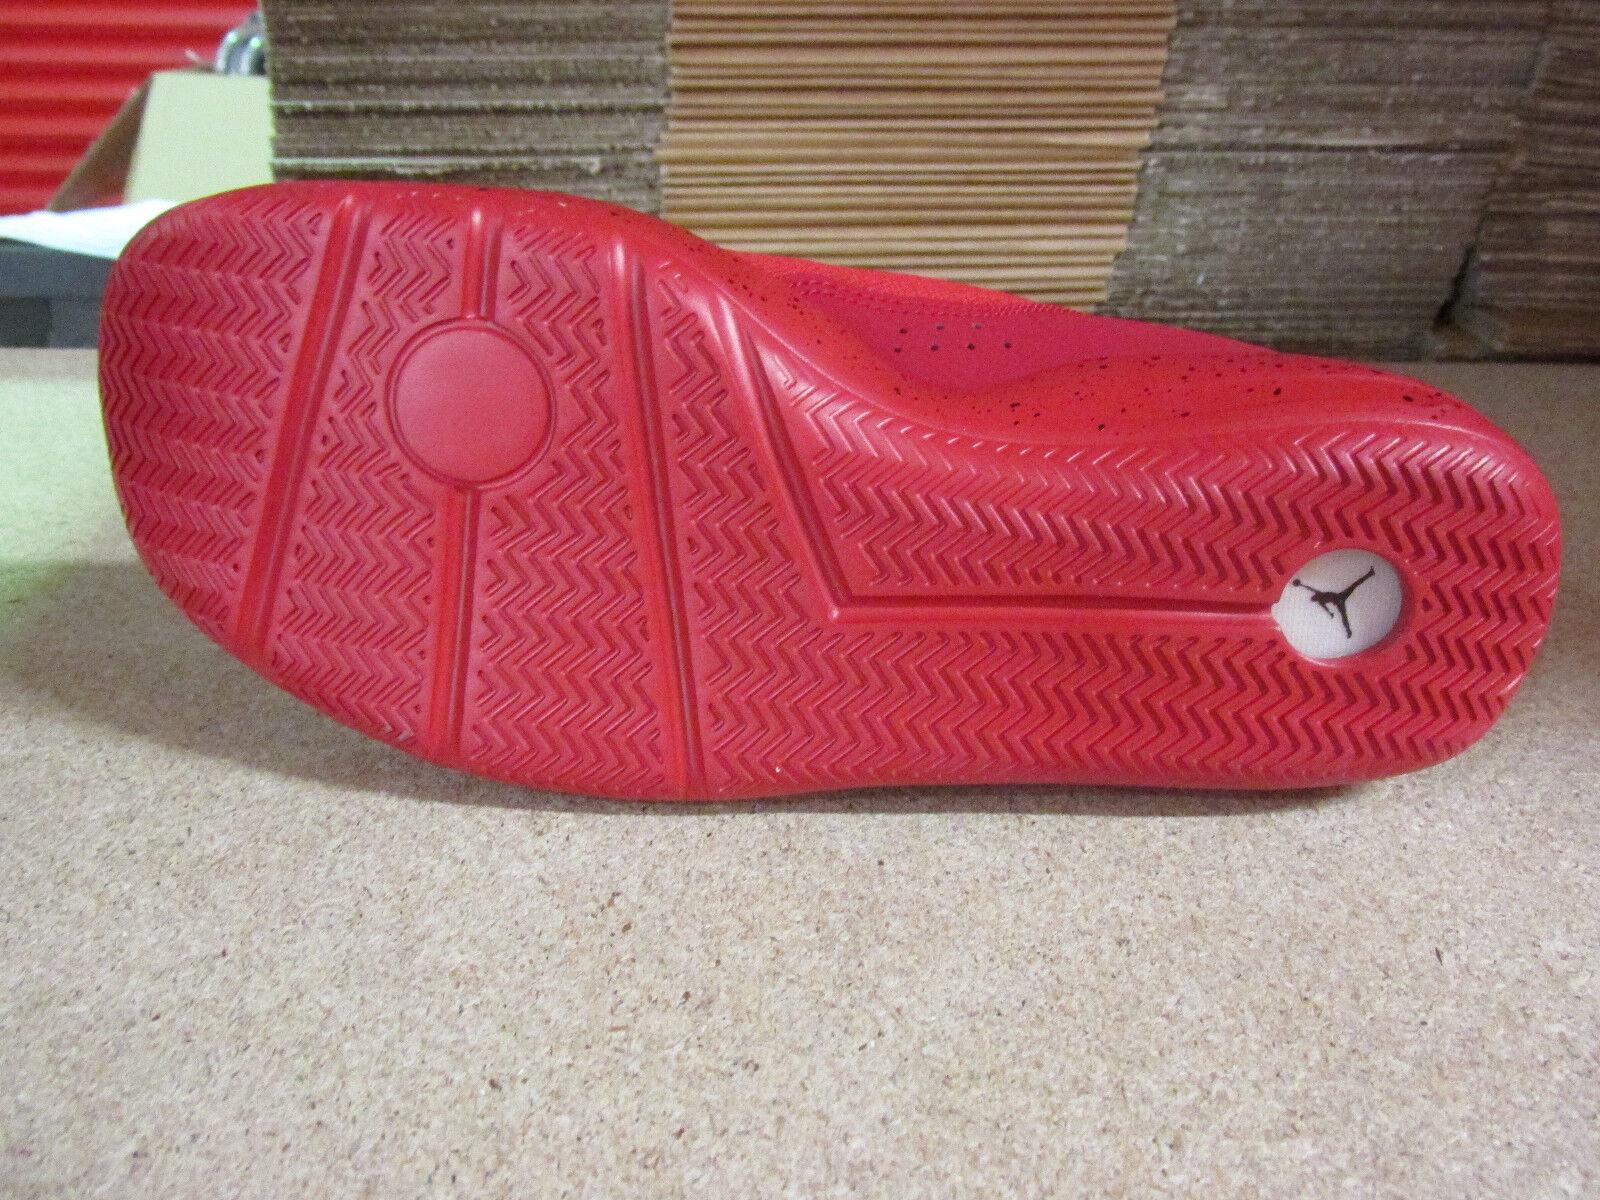 nike - air jordan zeigen, herren - nike trainer 834064 601 sneakers, schuhe a9bbf0